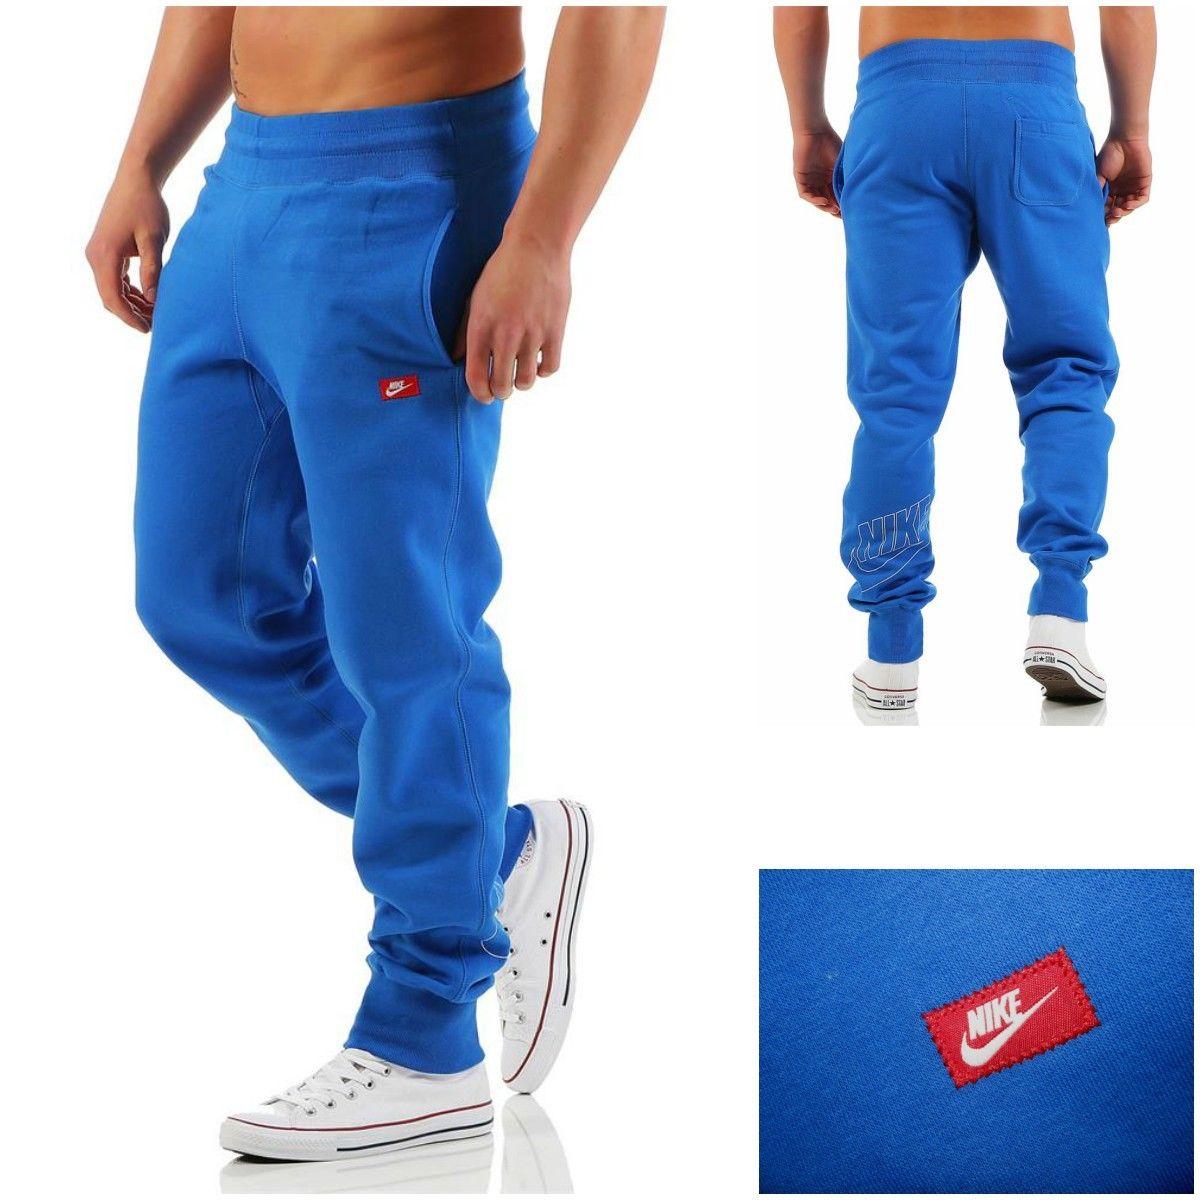 Nike Mens Sweat Pants Tracksuit Jogging Jog Bottoms Fleece Joggers Blue S, M NEW